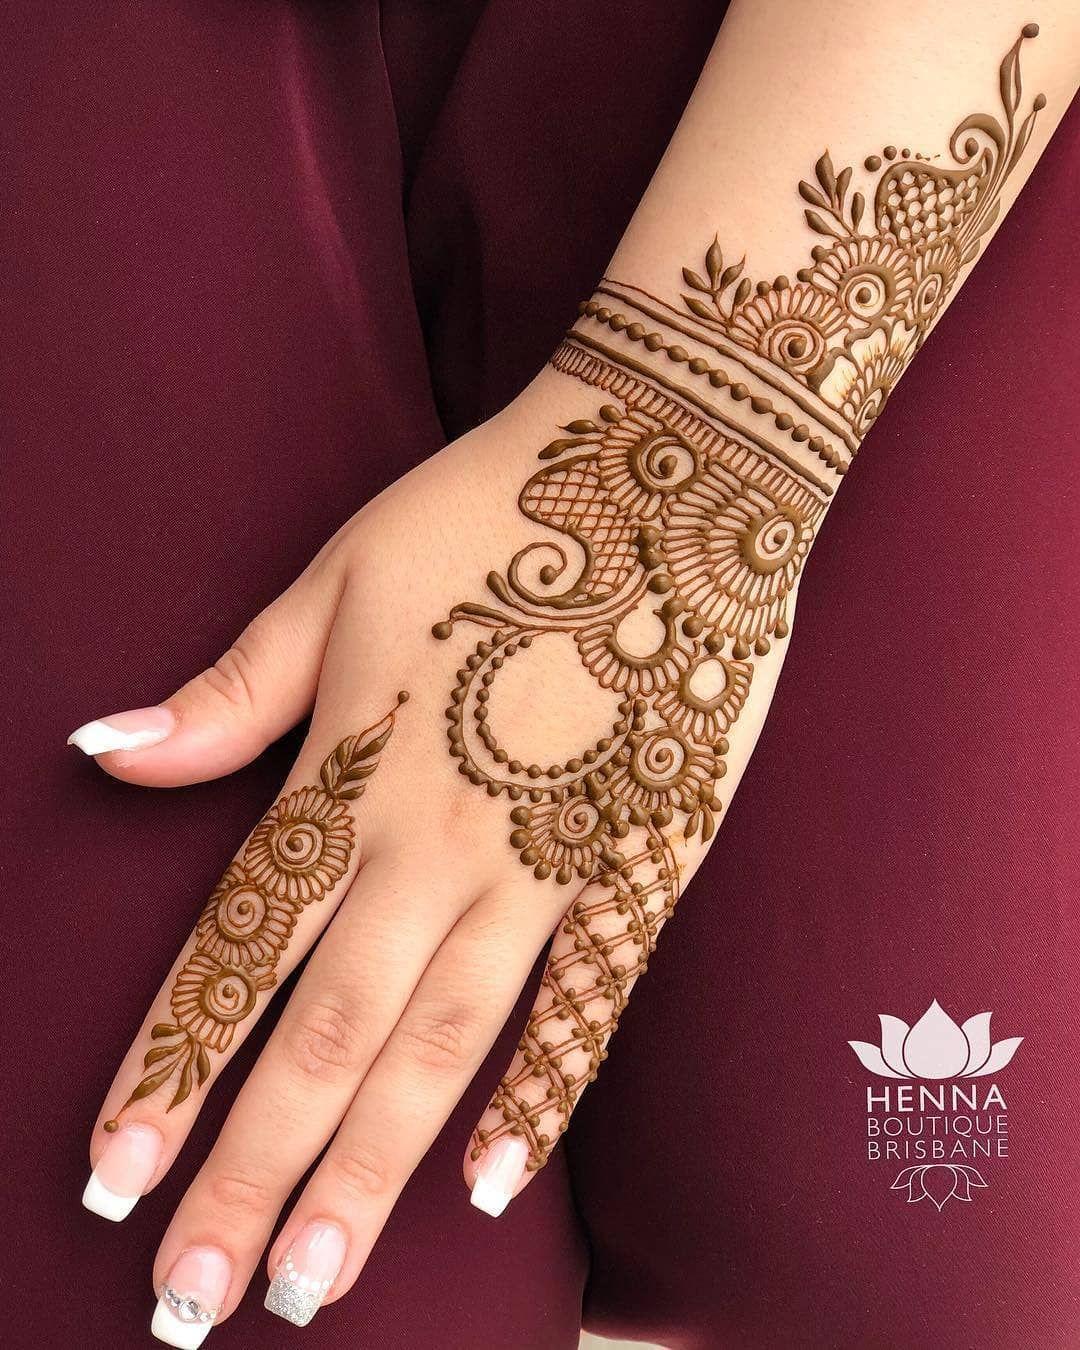 Pin By V Poncheva On Mehandi Designs New Mehndi Designs Henna Designs Hand Mehndi Designs For Girls